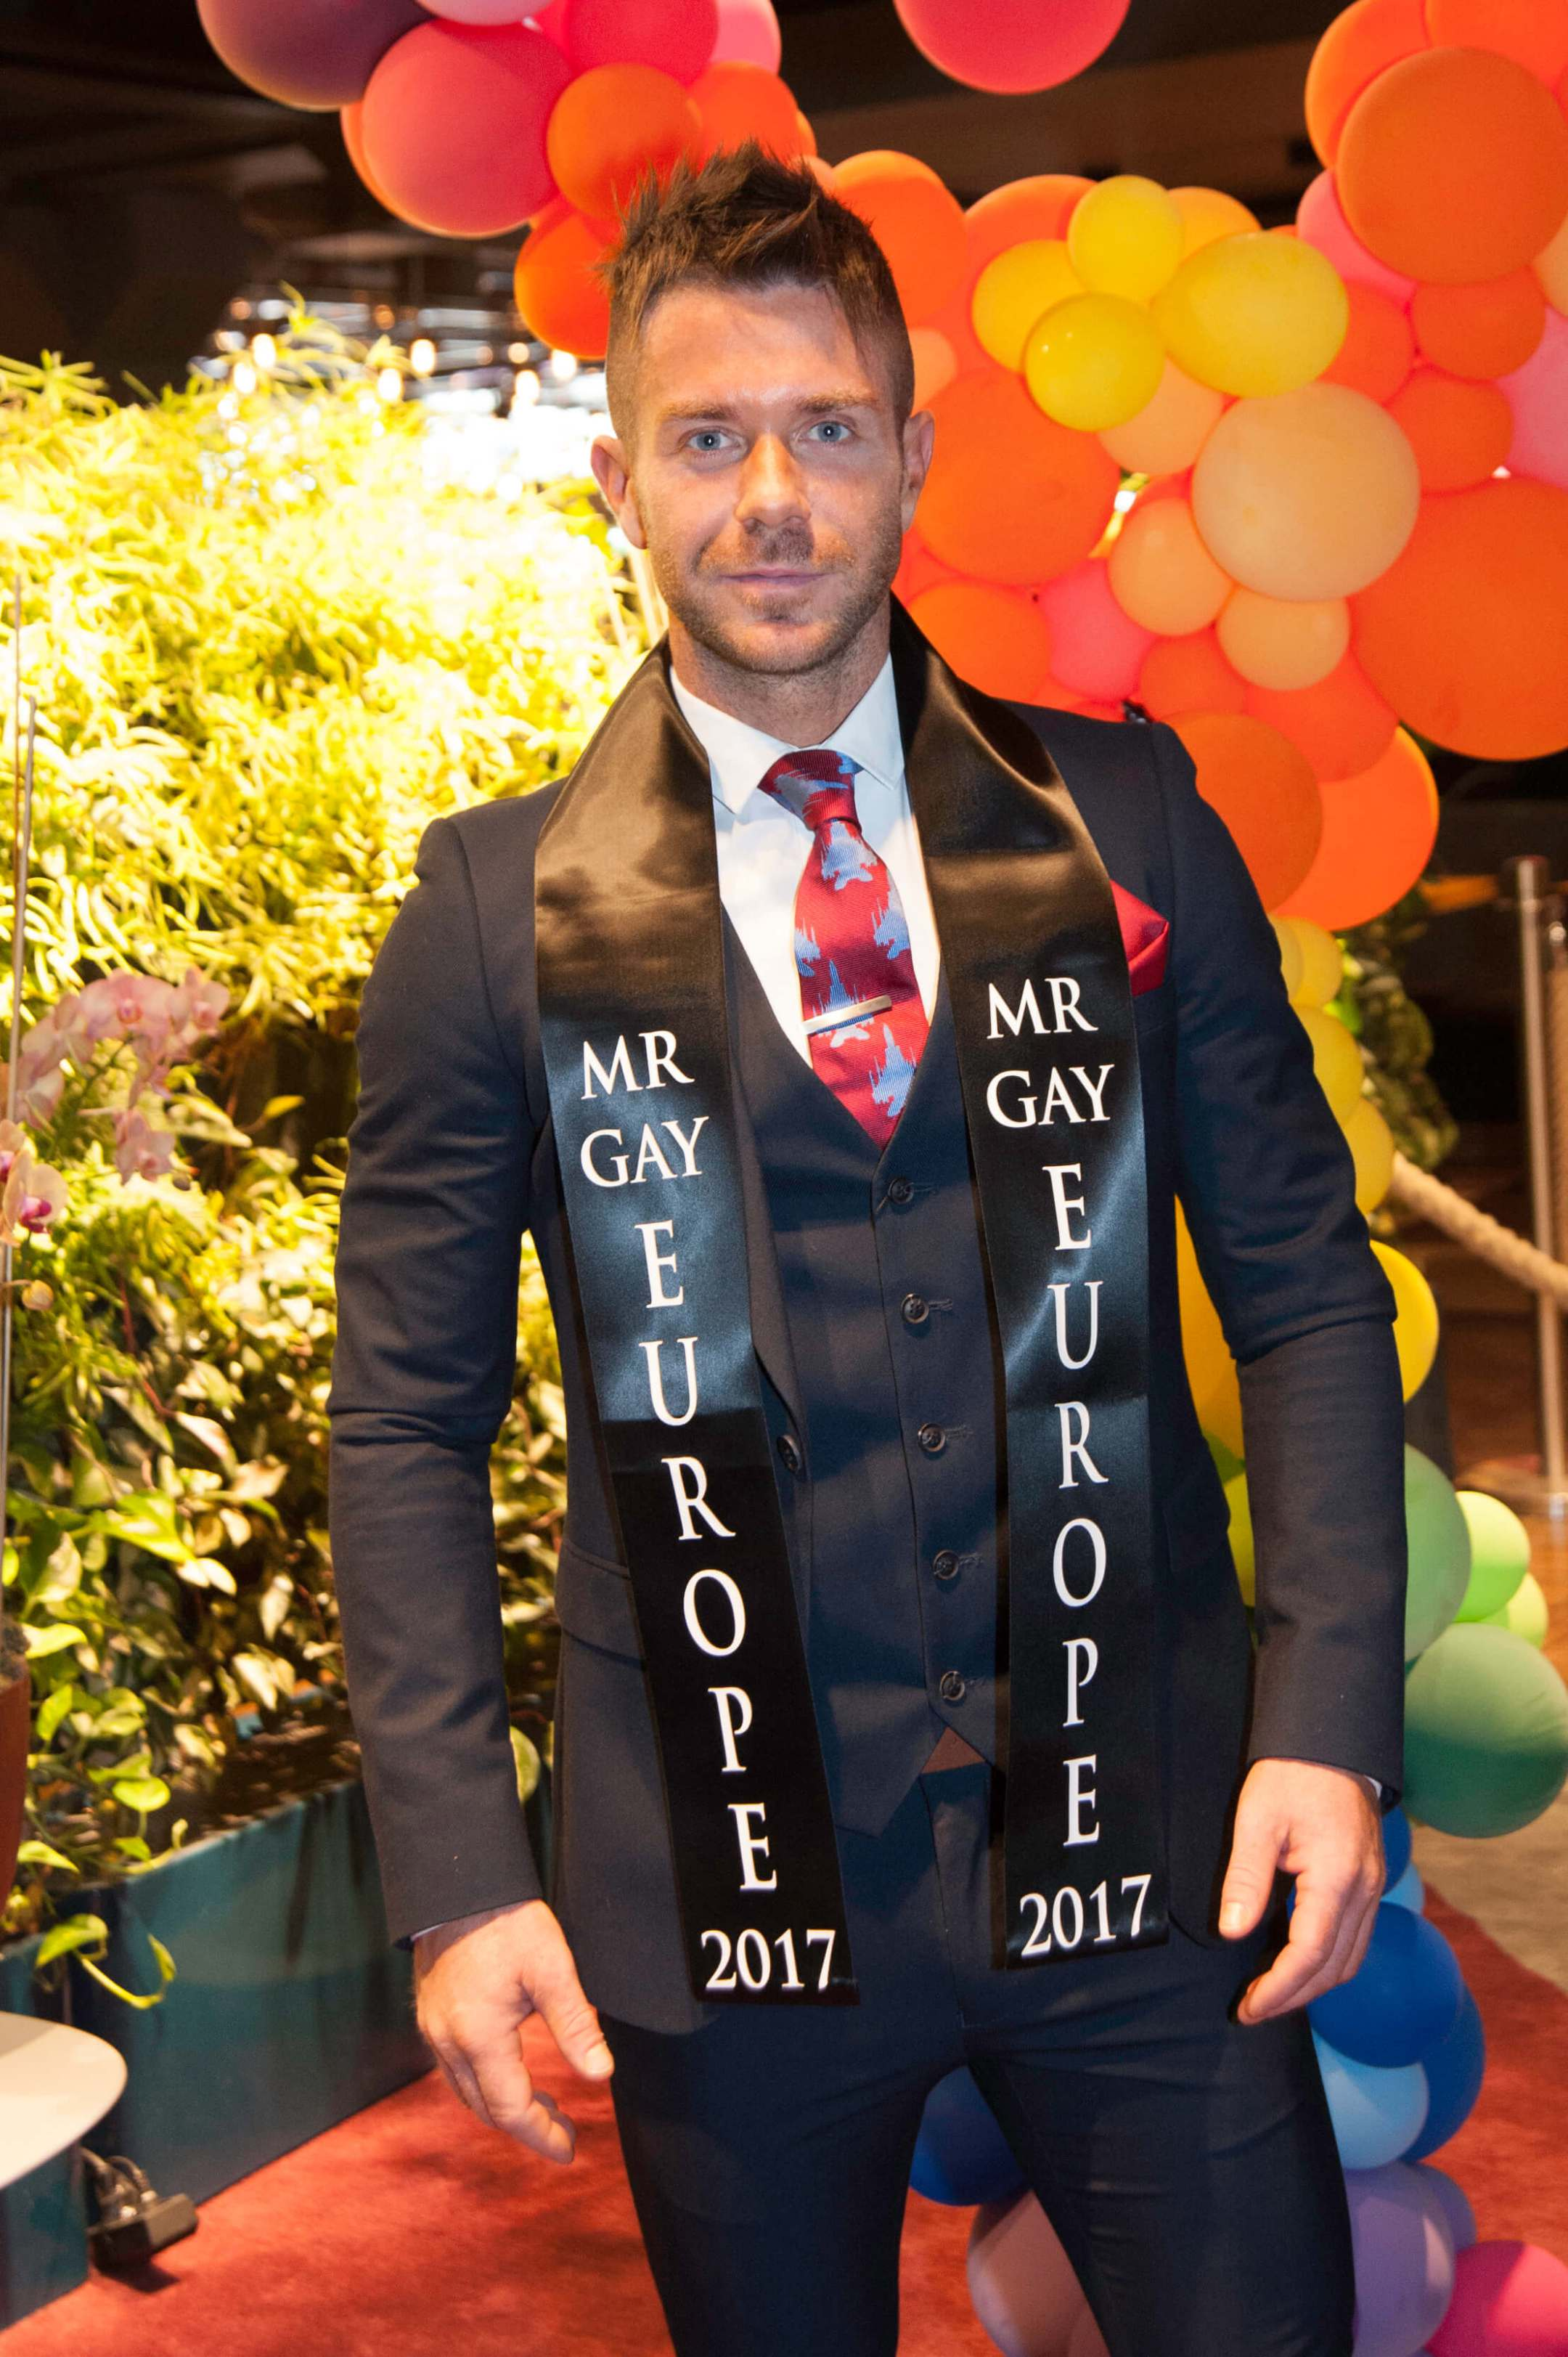 mr. gay europe